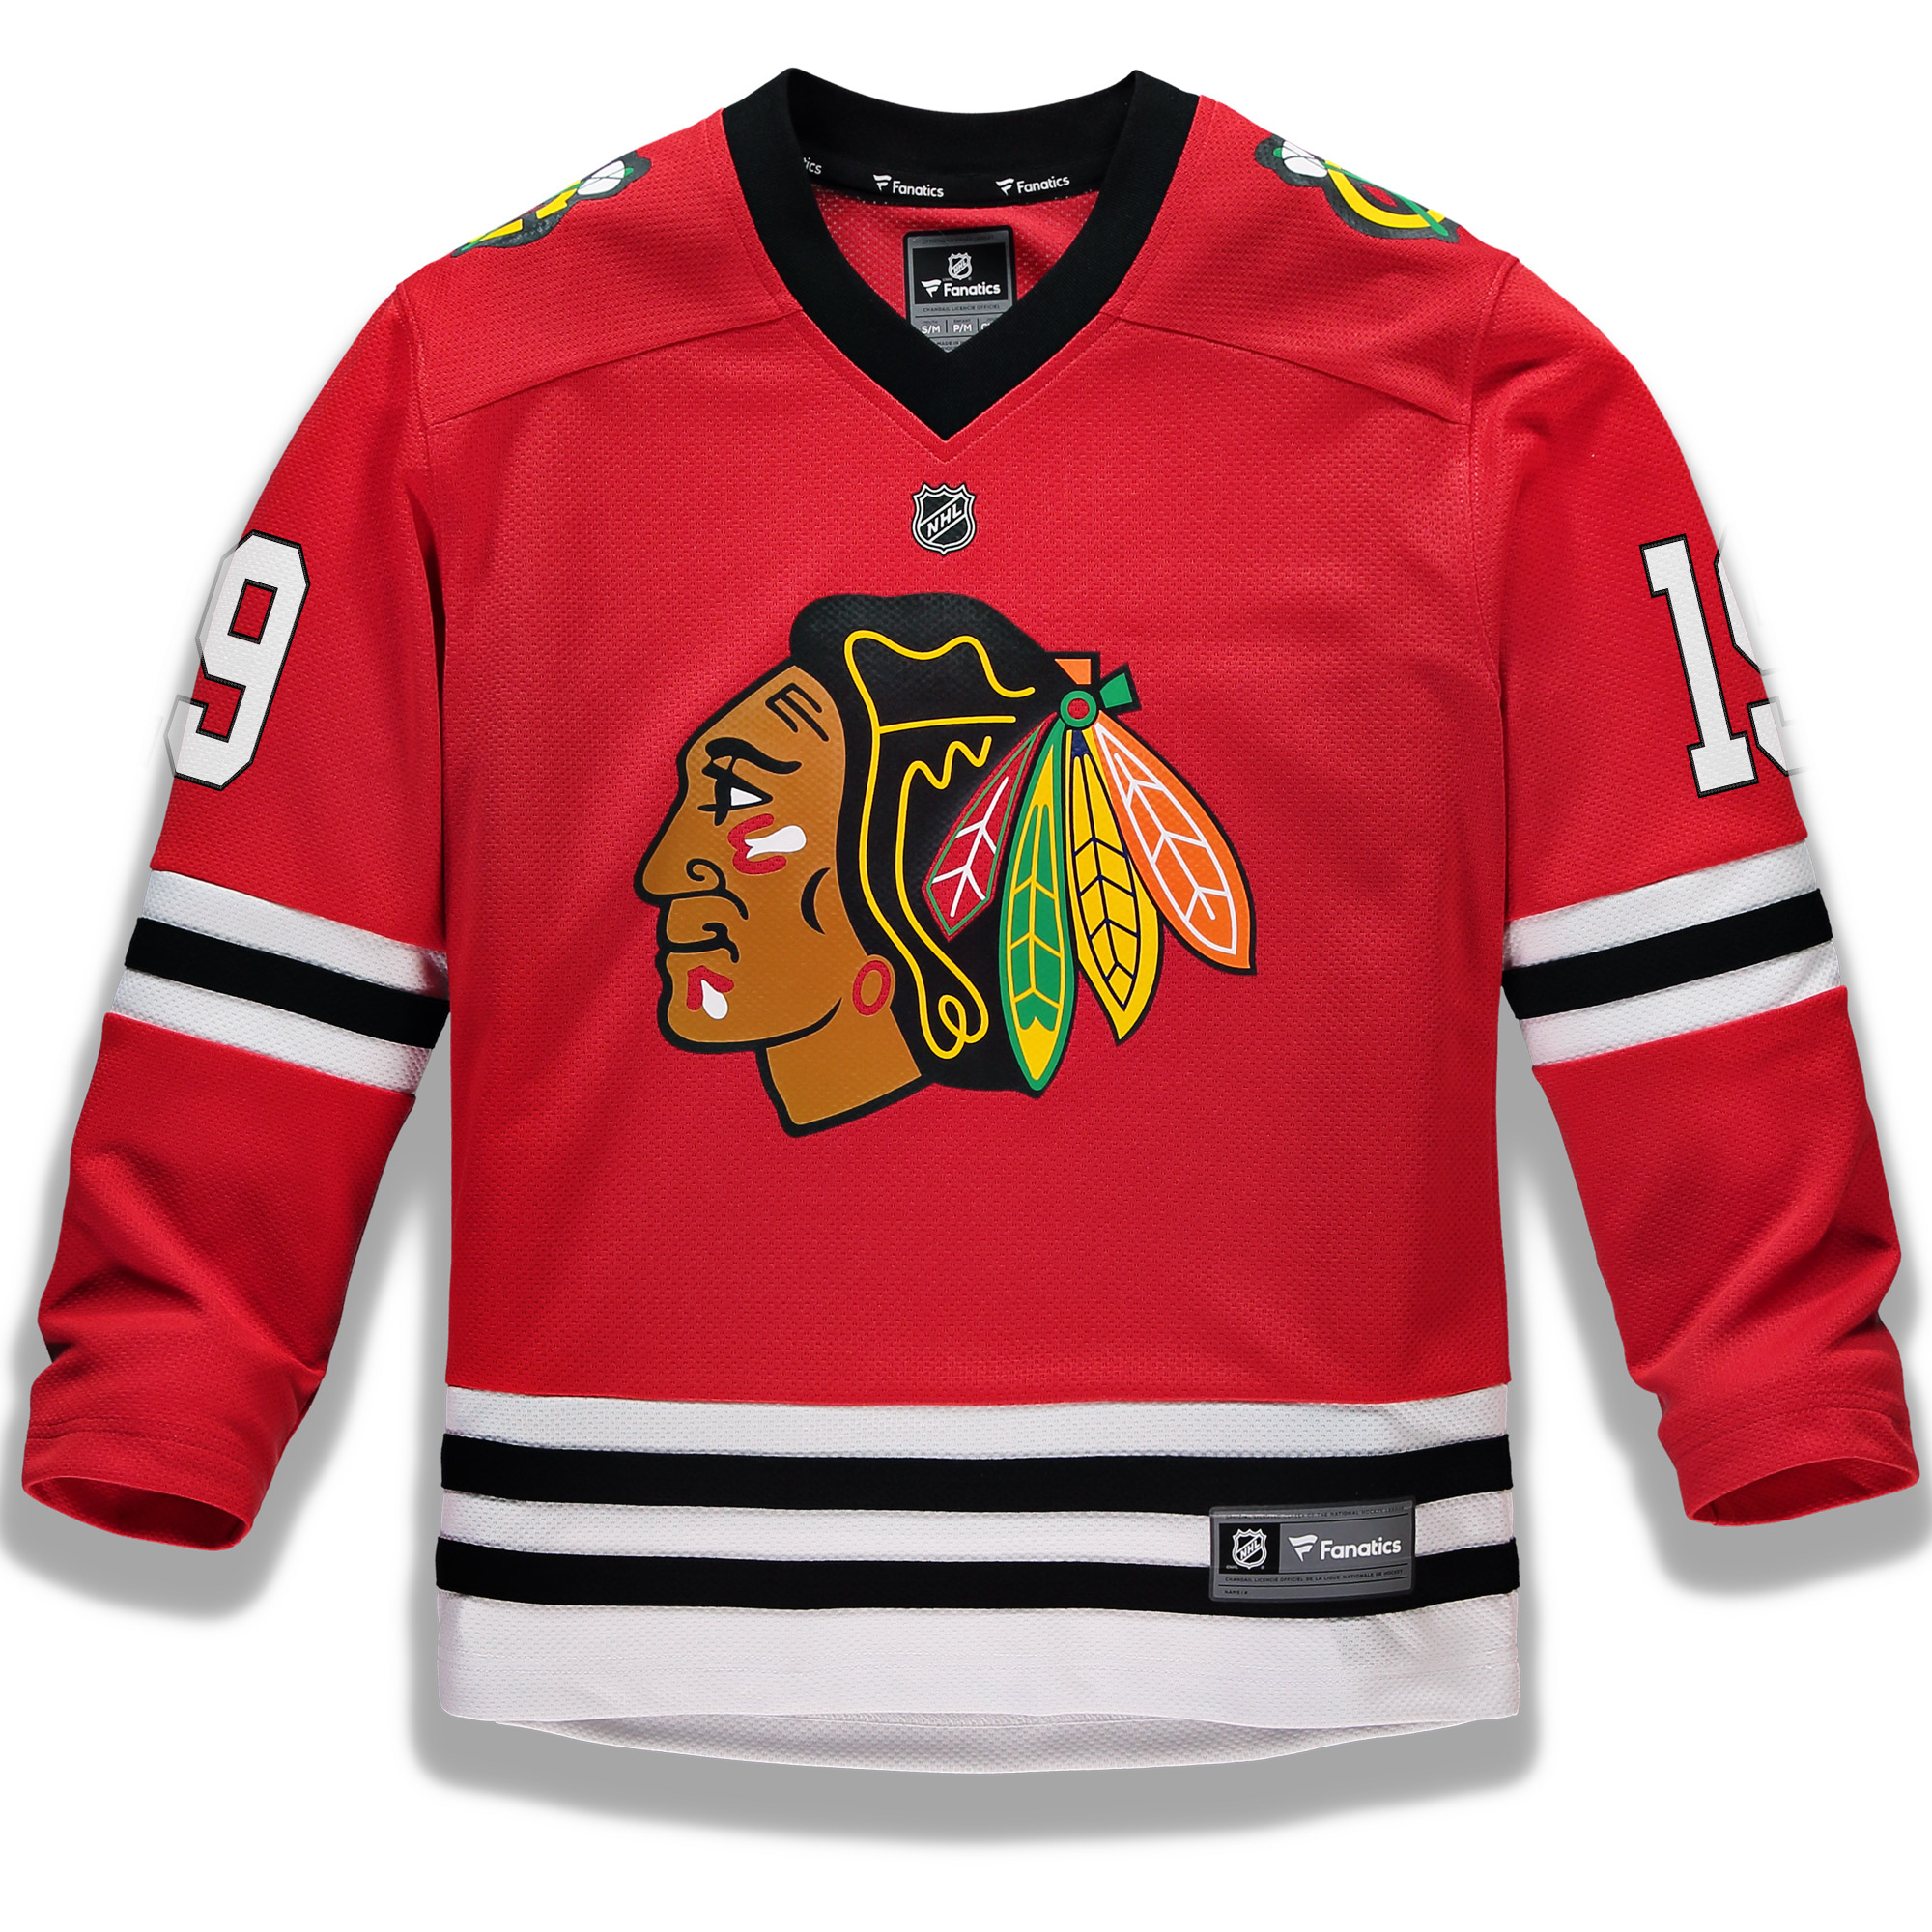 f302e0887a6 Jonathan Toews Chicago Blackhawks Fanatics Branded Youth Replica ...